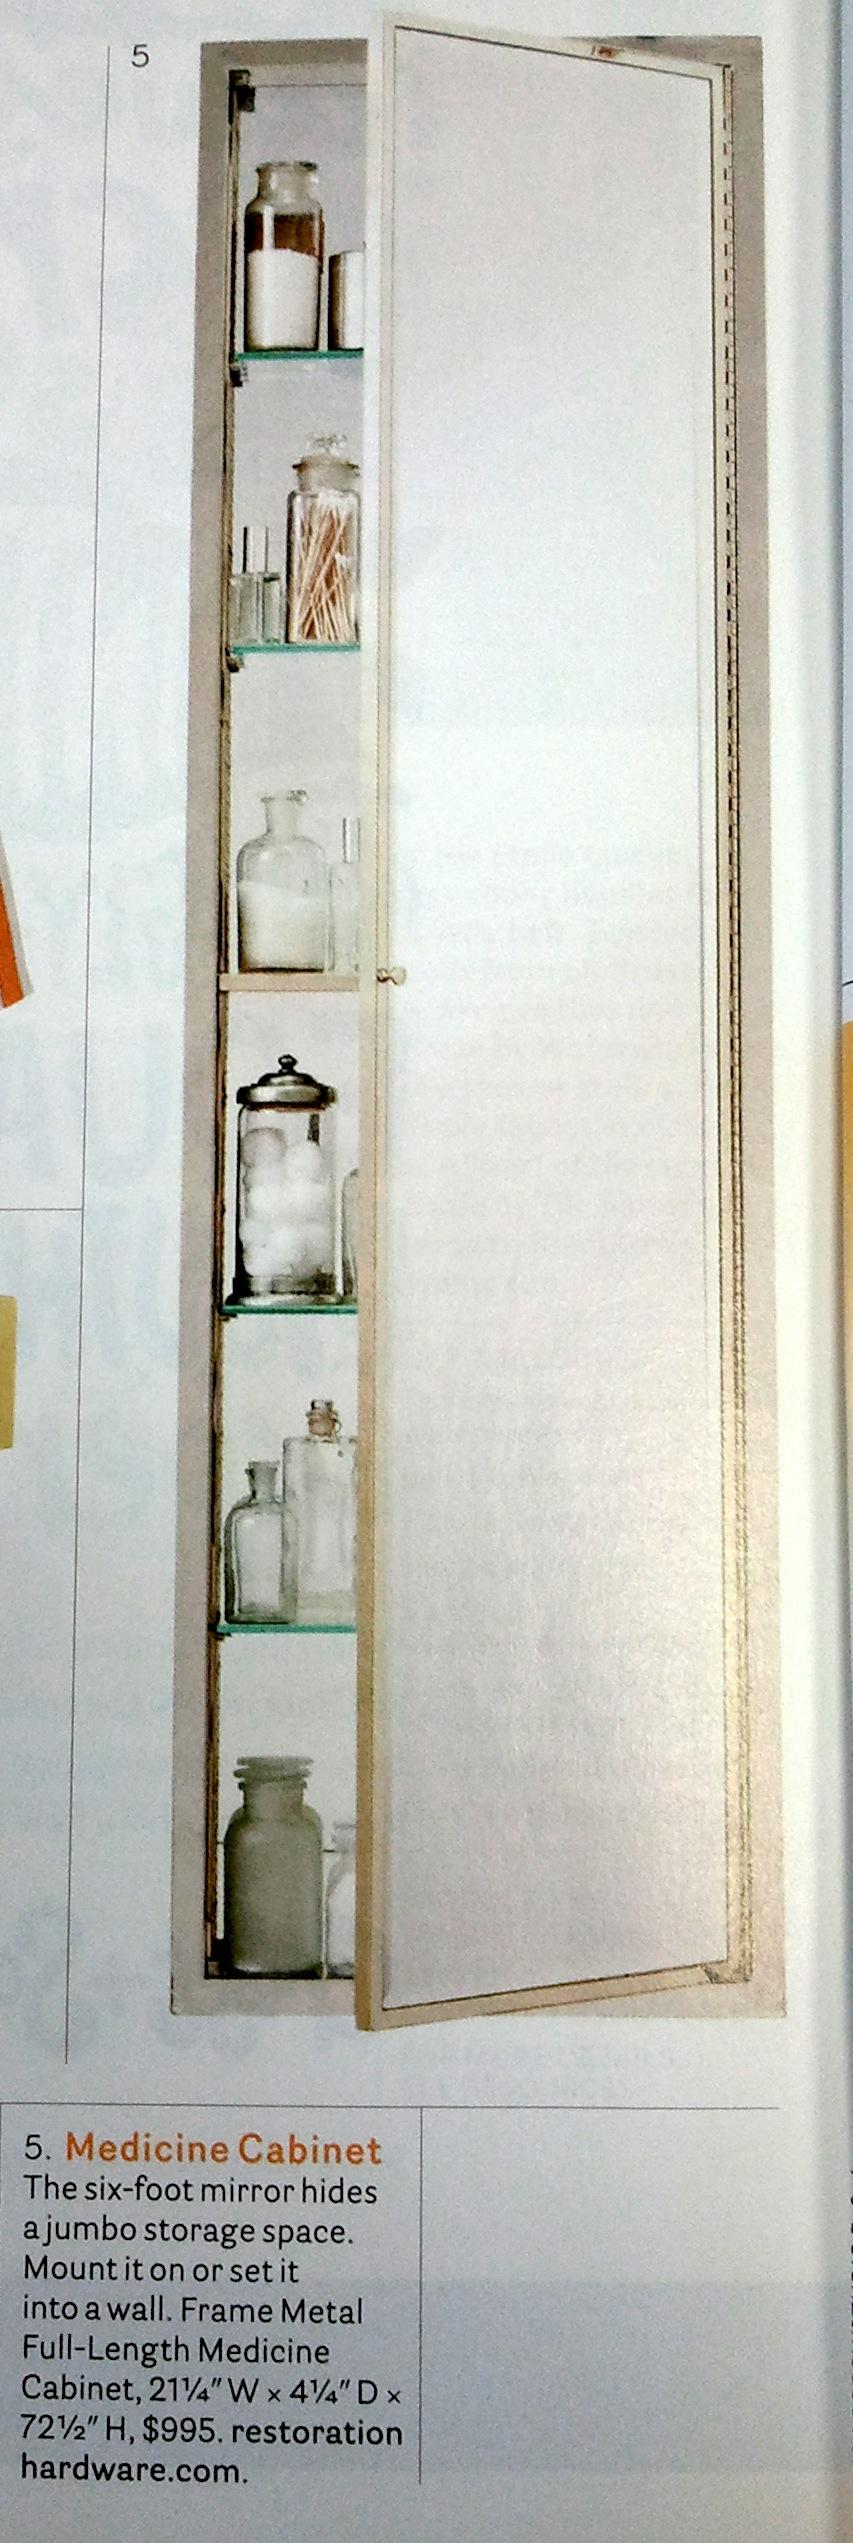 steel mirror with corner polished open popen medicine restoration stainless cabinet kugler hardware